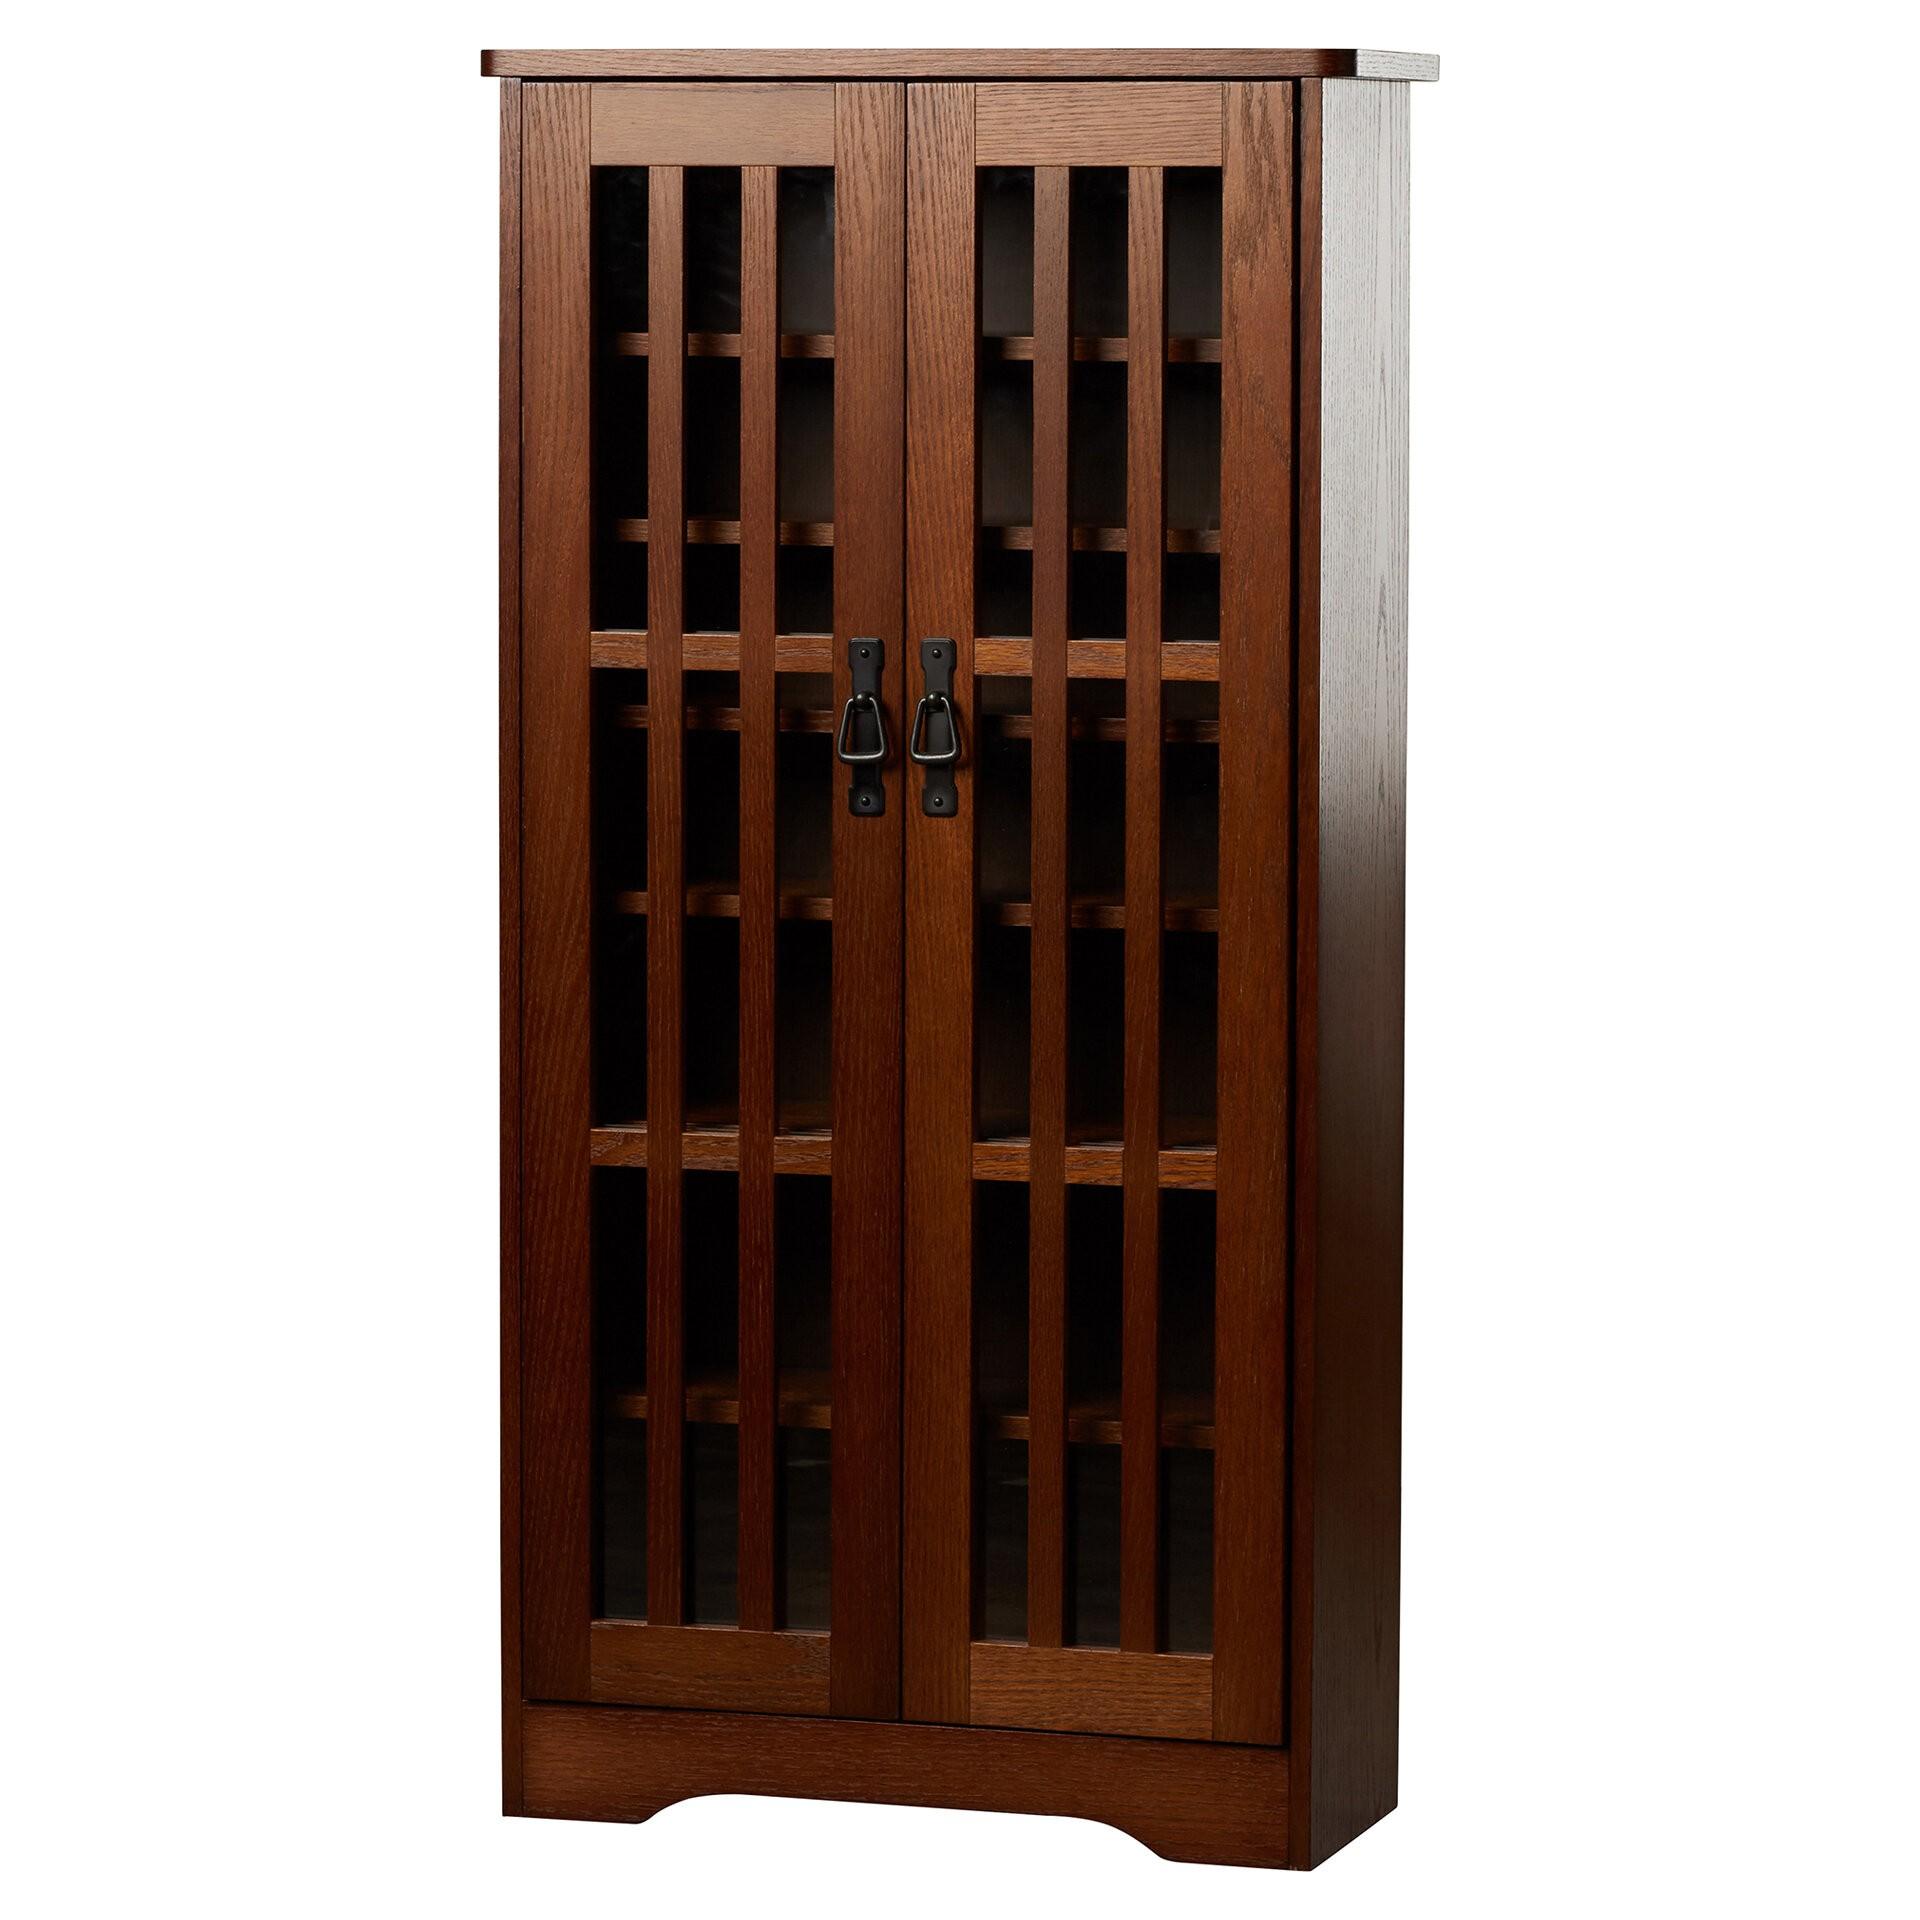 Pecke Multimedia Storage Cabinet